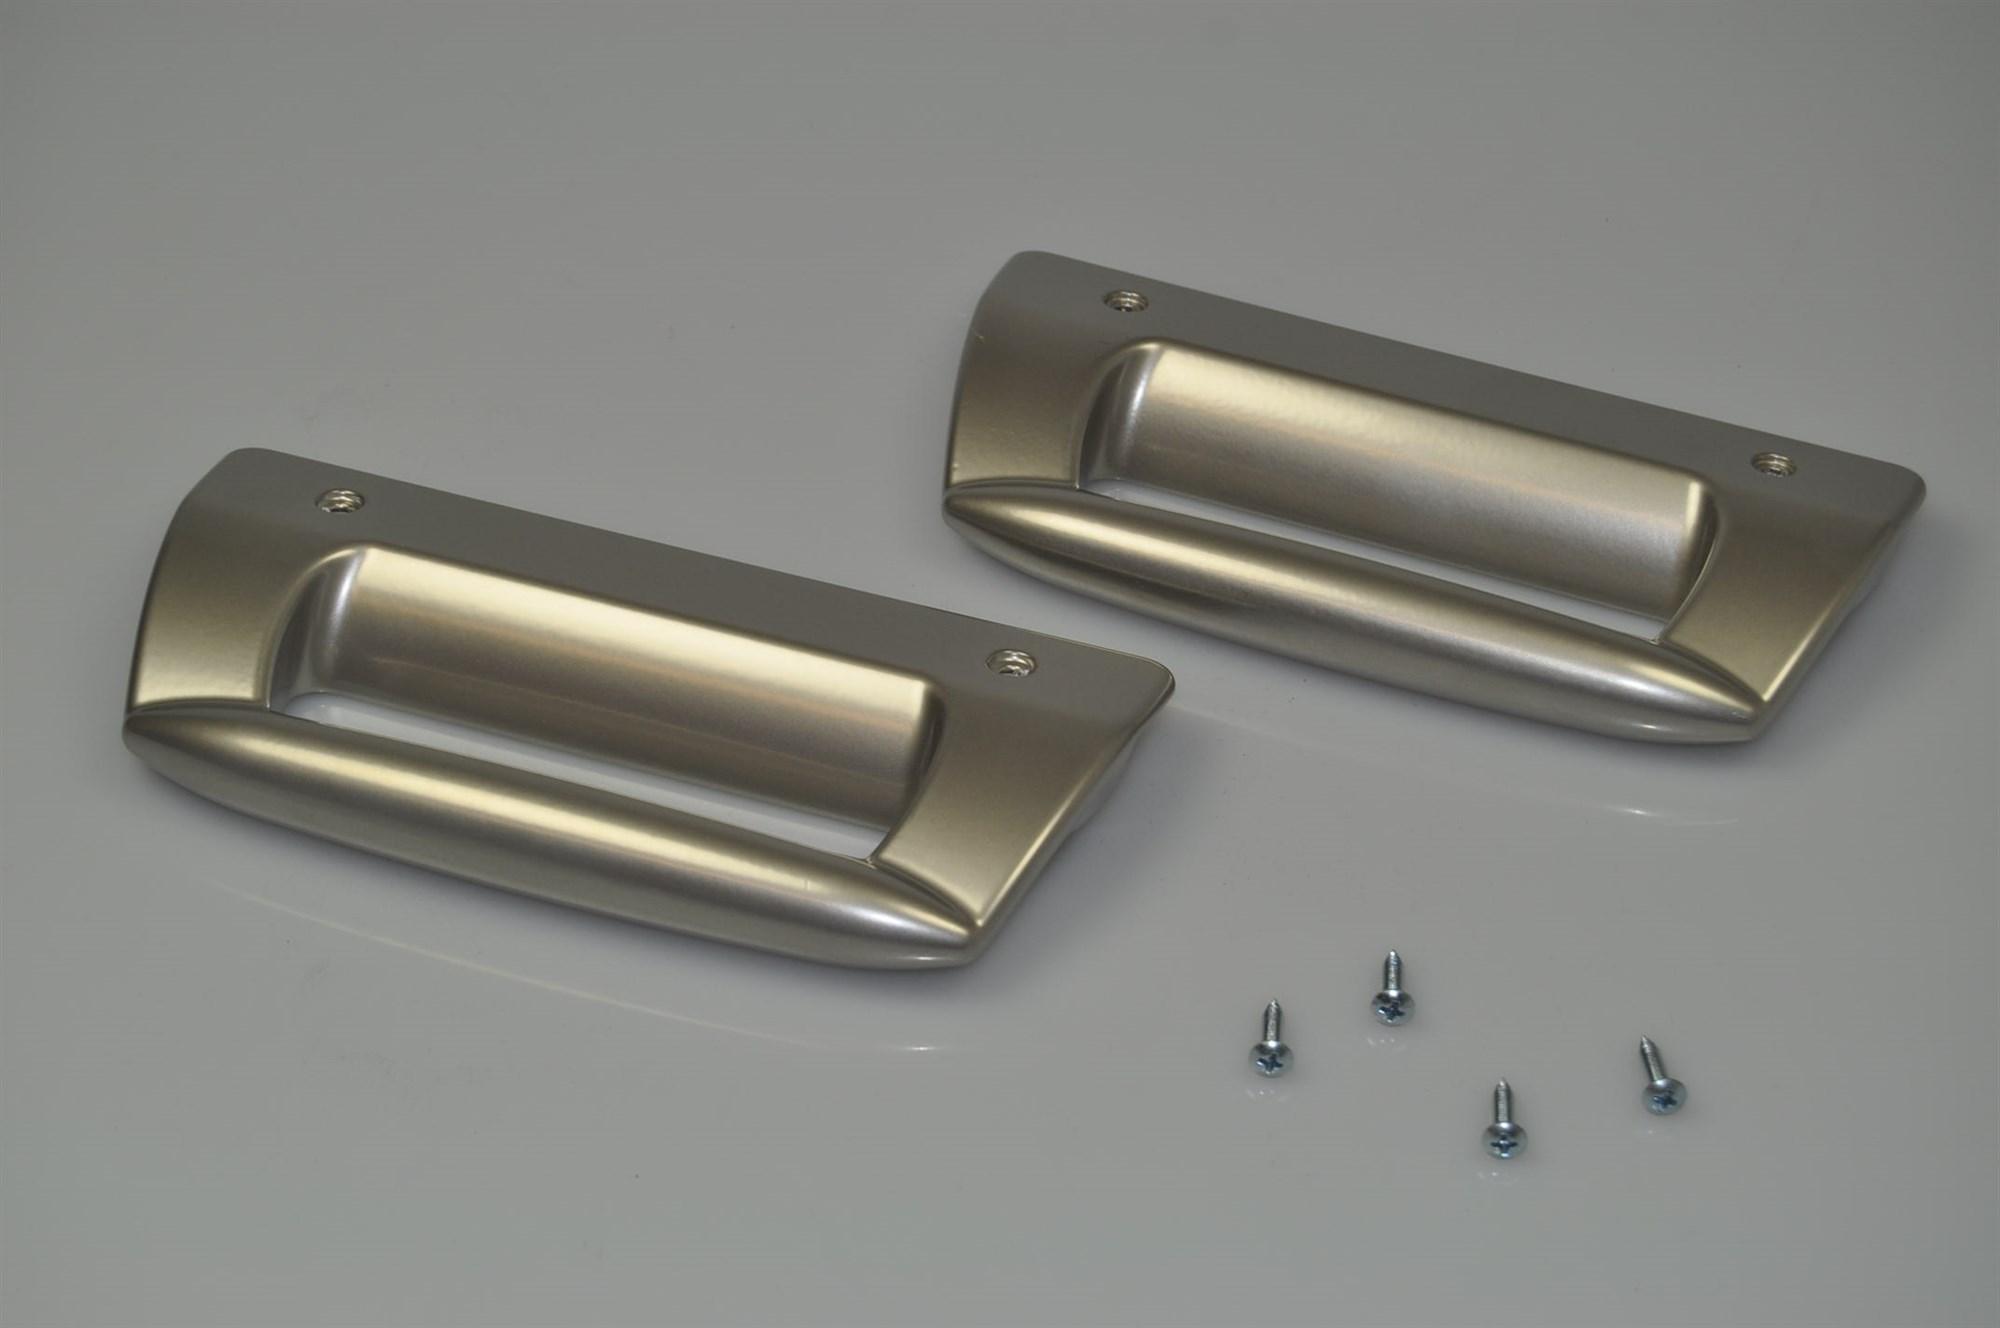 Handle Electrolux Fridge Amp Freezer Gray